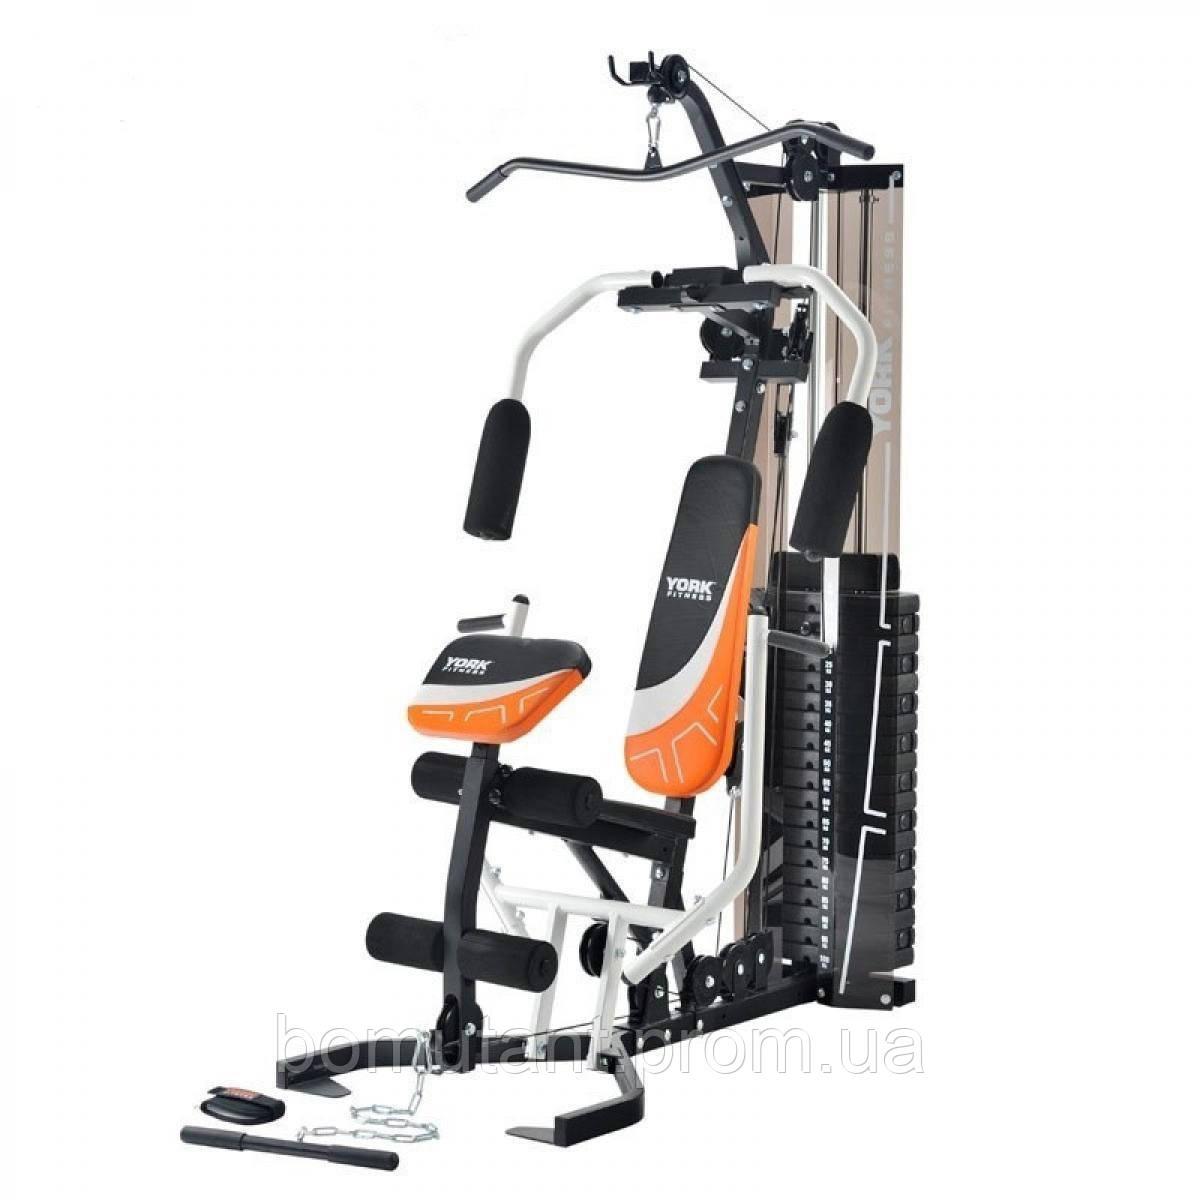 Силовая станция Perform Gym York Fitness